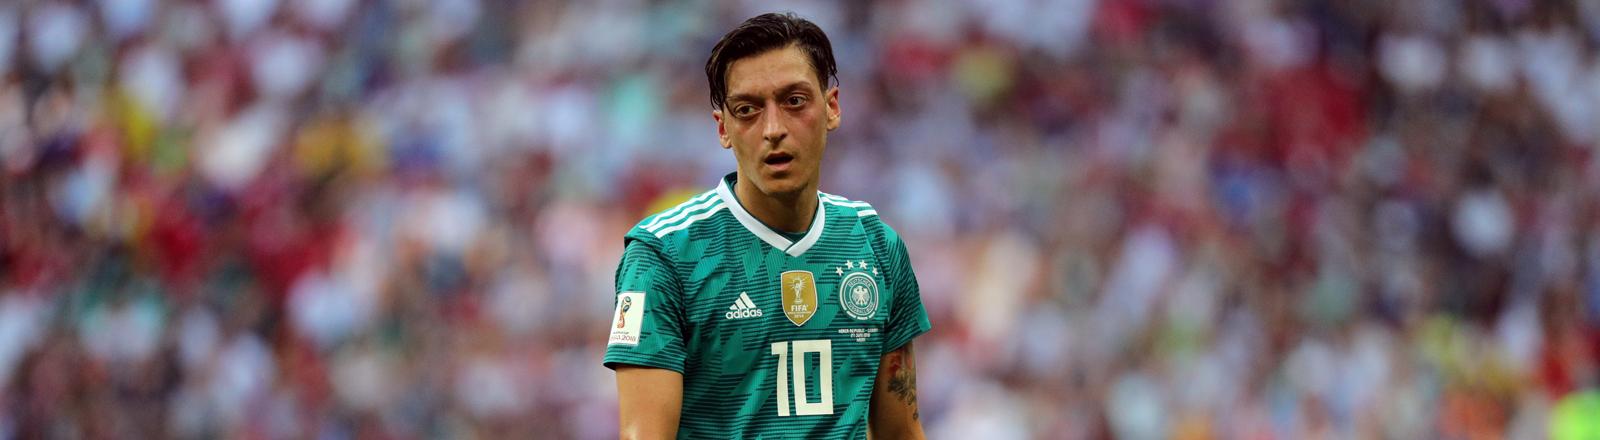 Mesut Özil beim WM-Spiel gegen Russland